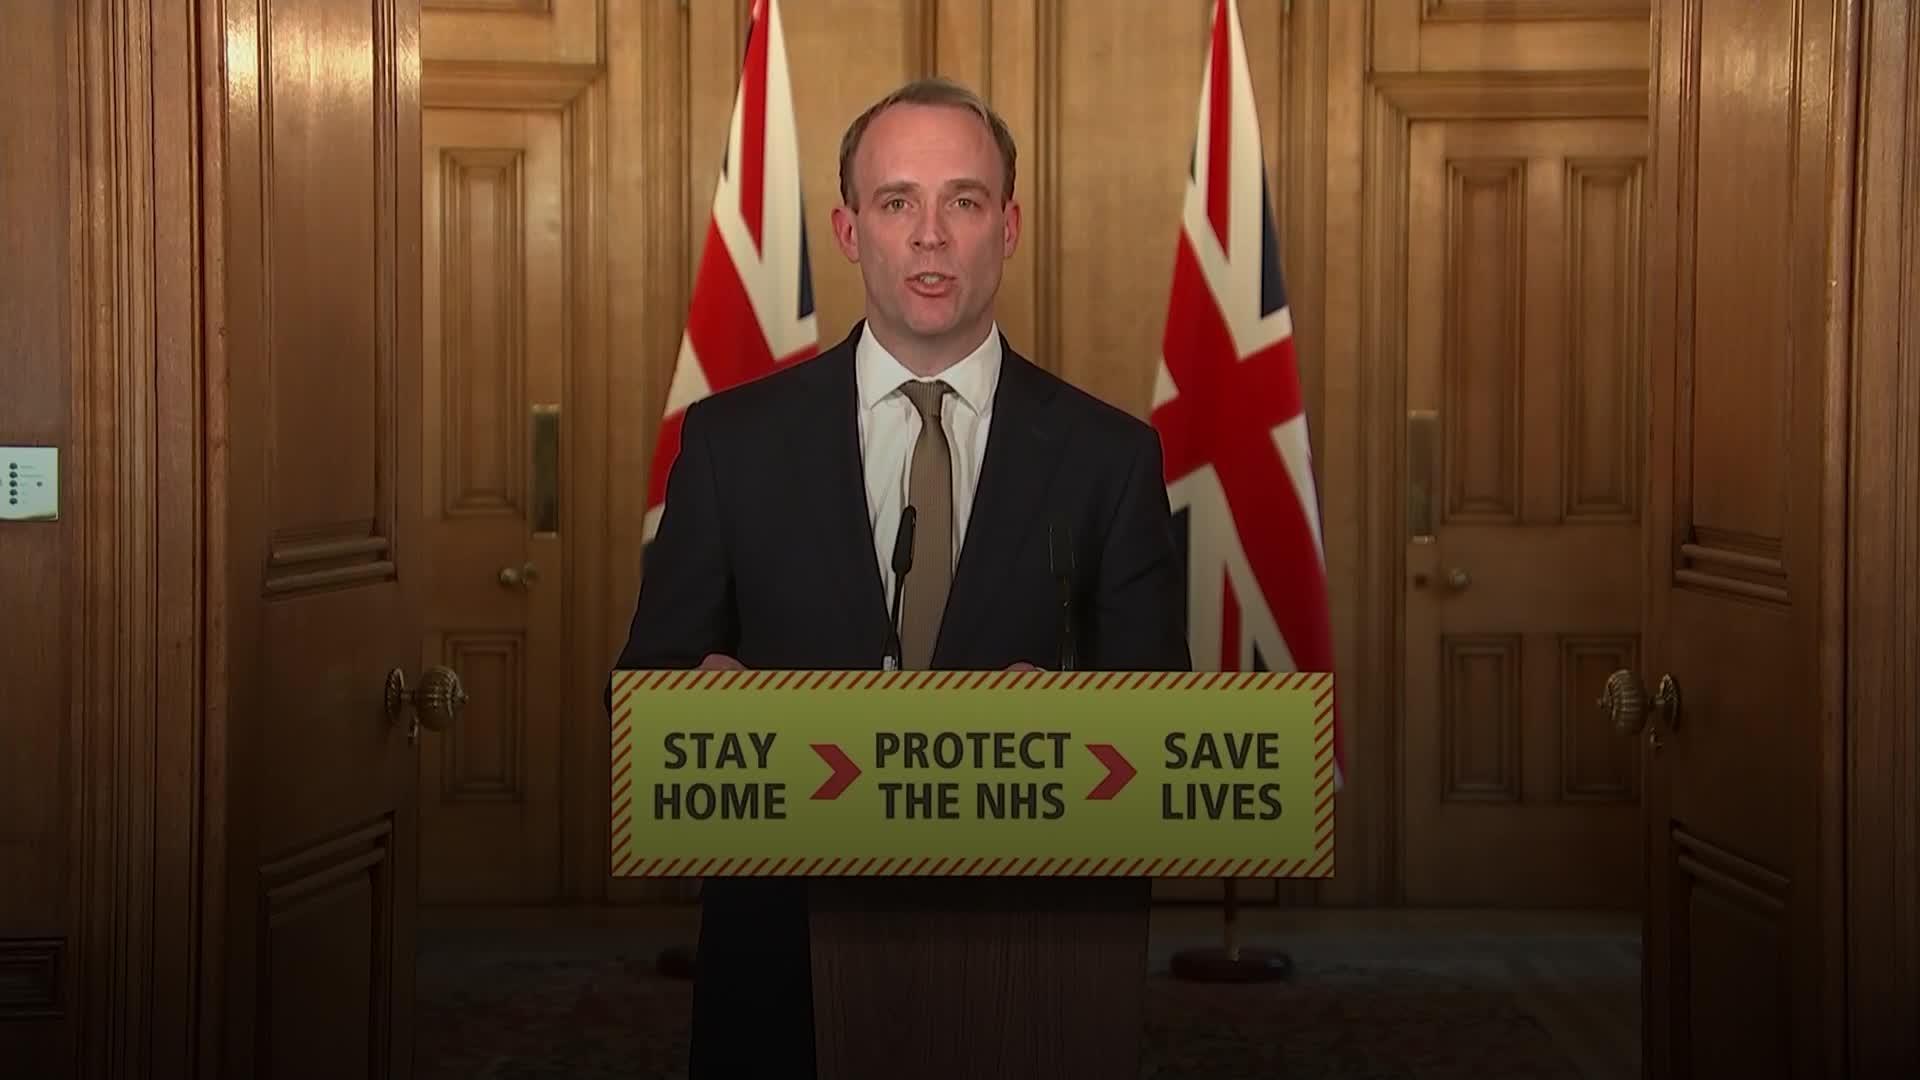 Coronavirus: Charter flights to help stranded Britons get home